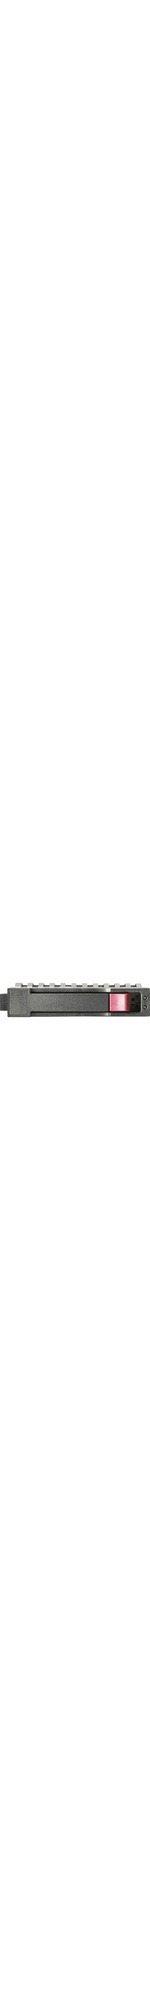 HP 600 GB 2.5And#34; Internal Hard Drive - SAS - 15000 - Hot Pluggable